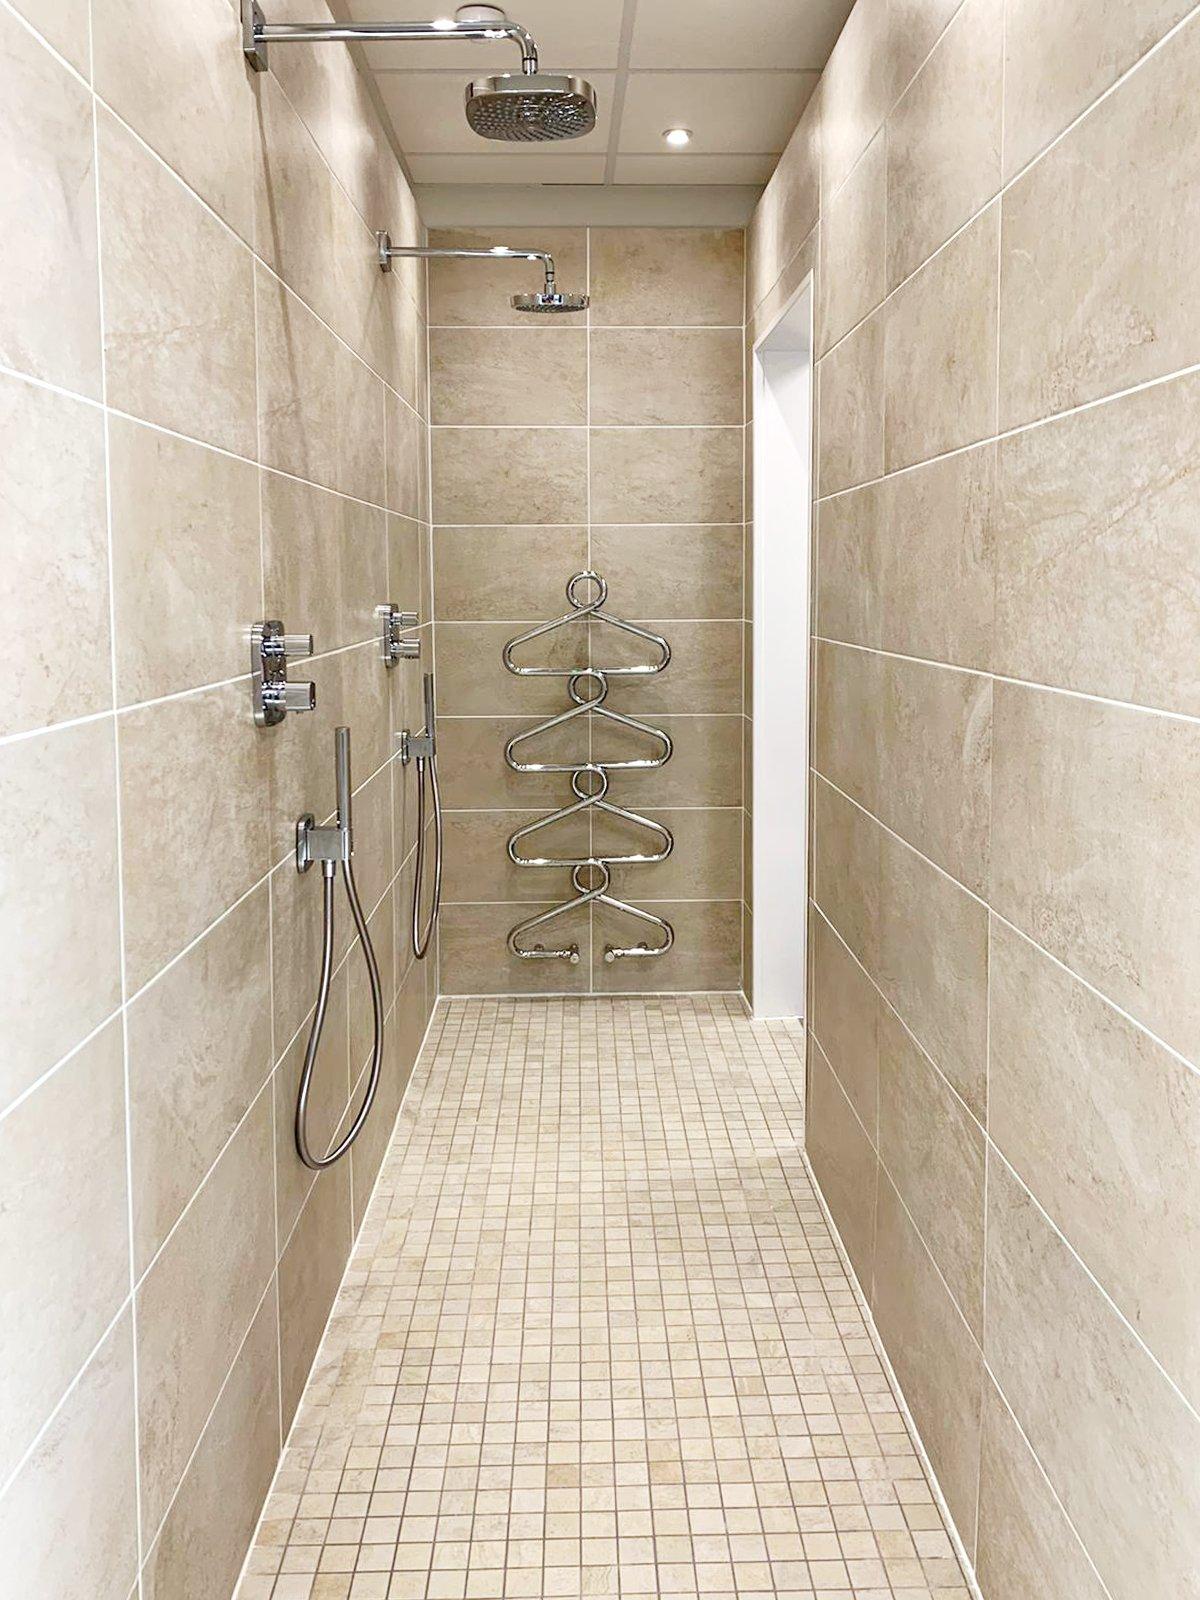 Walk-in twin shower heads in enclosed wet room area of a modern bathroom